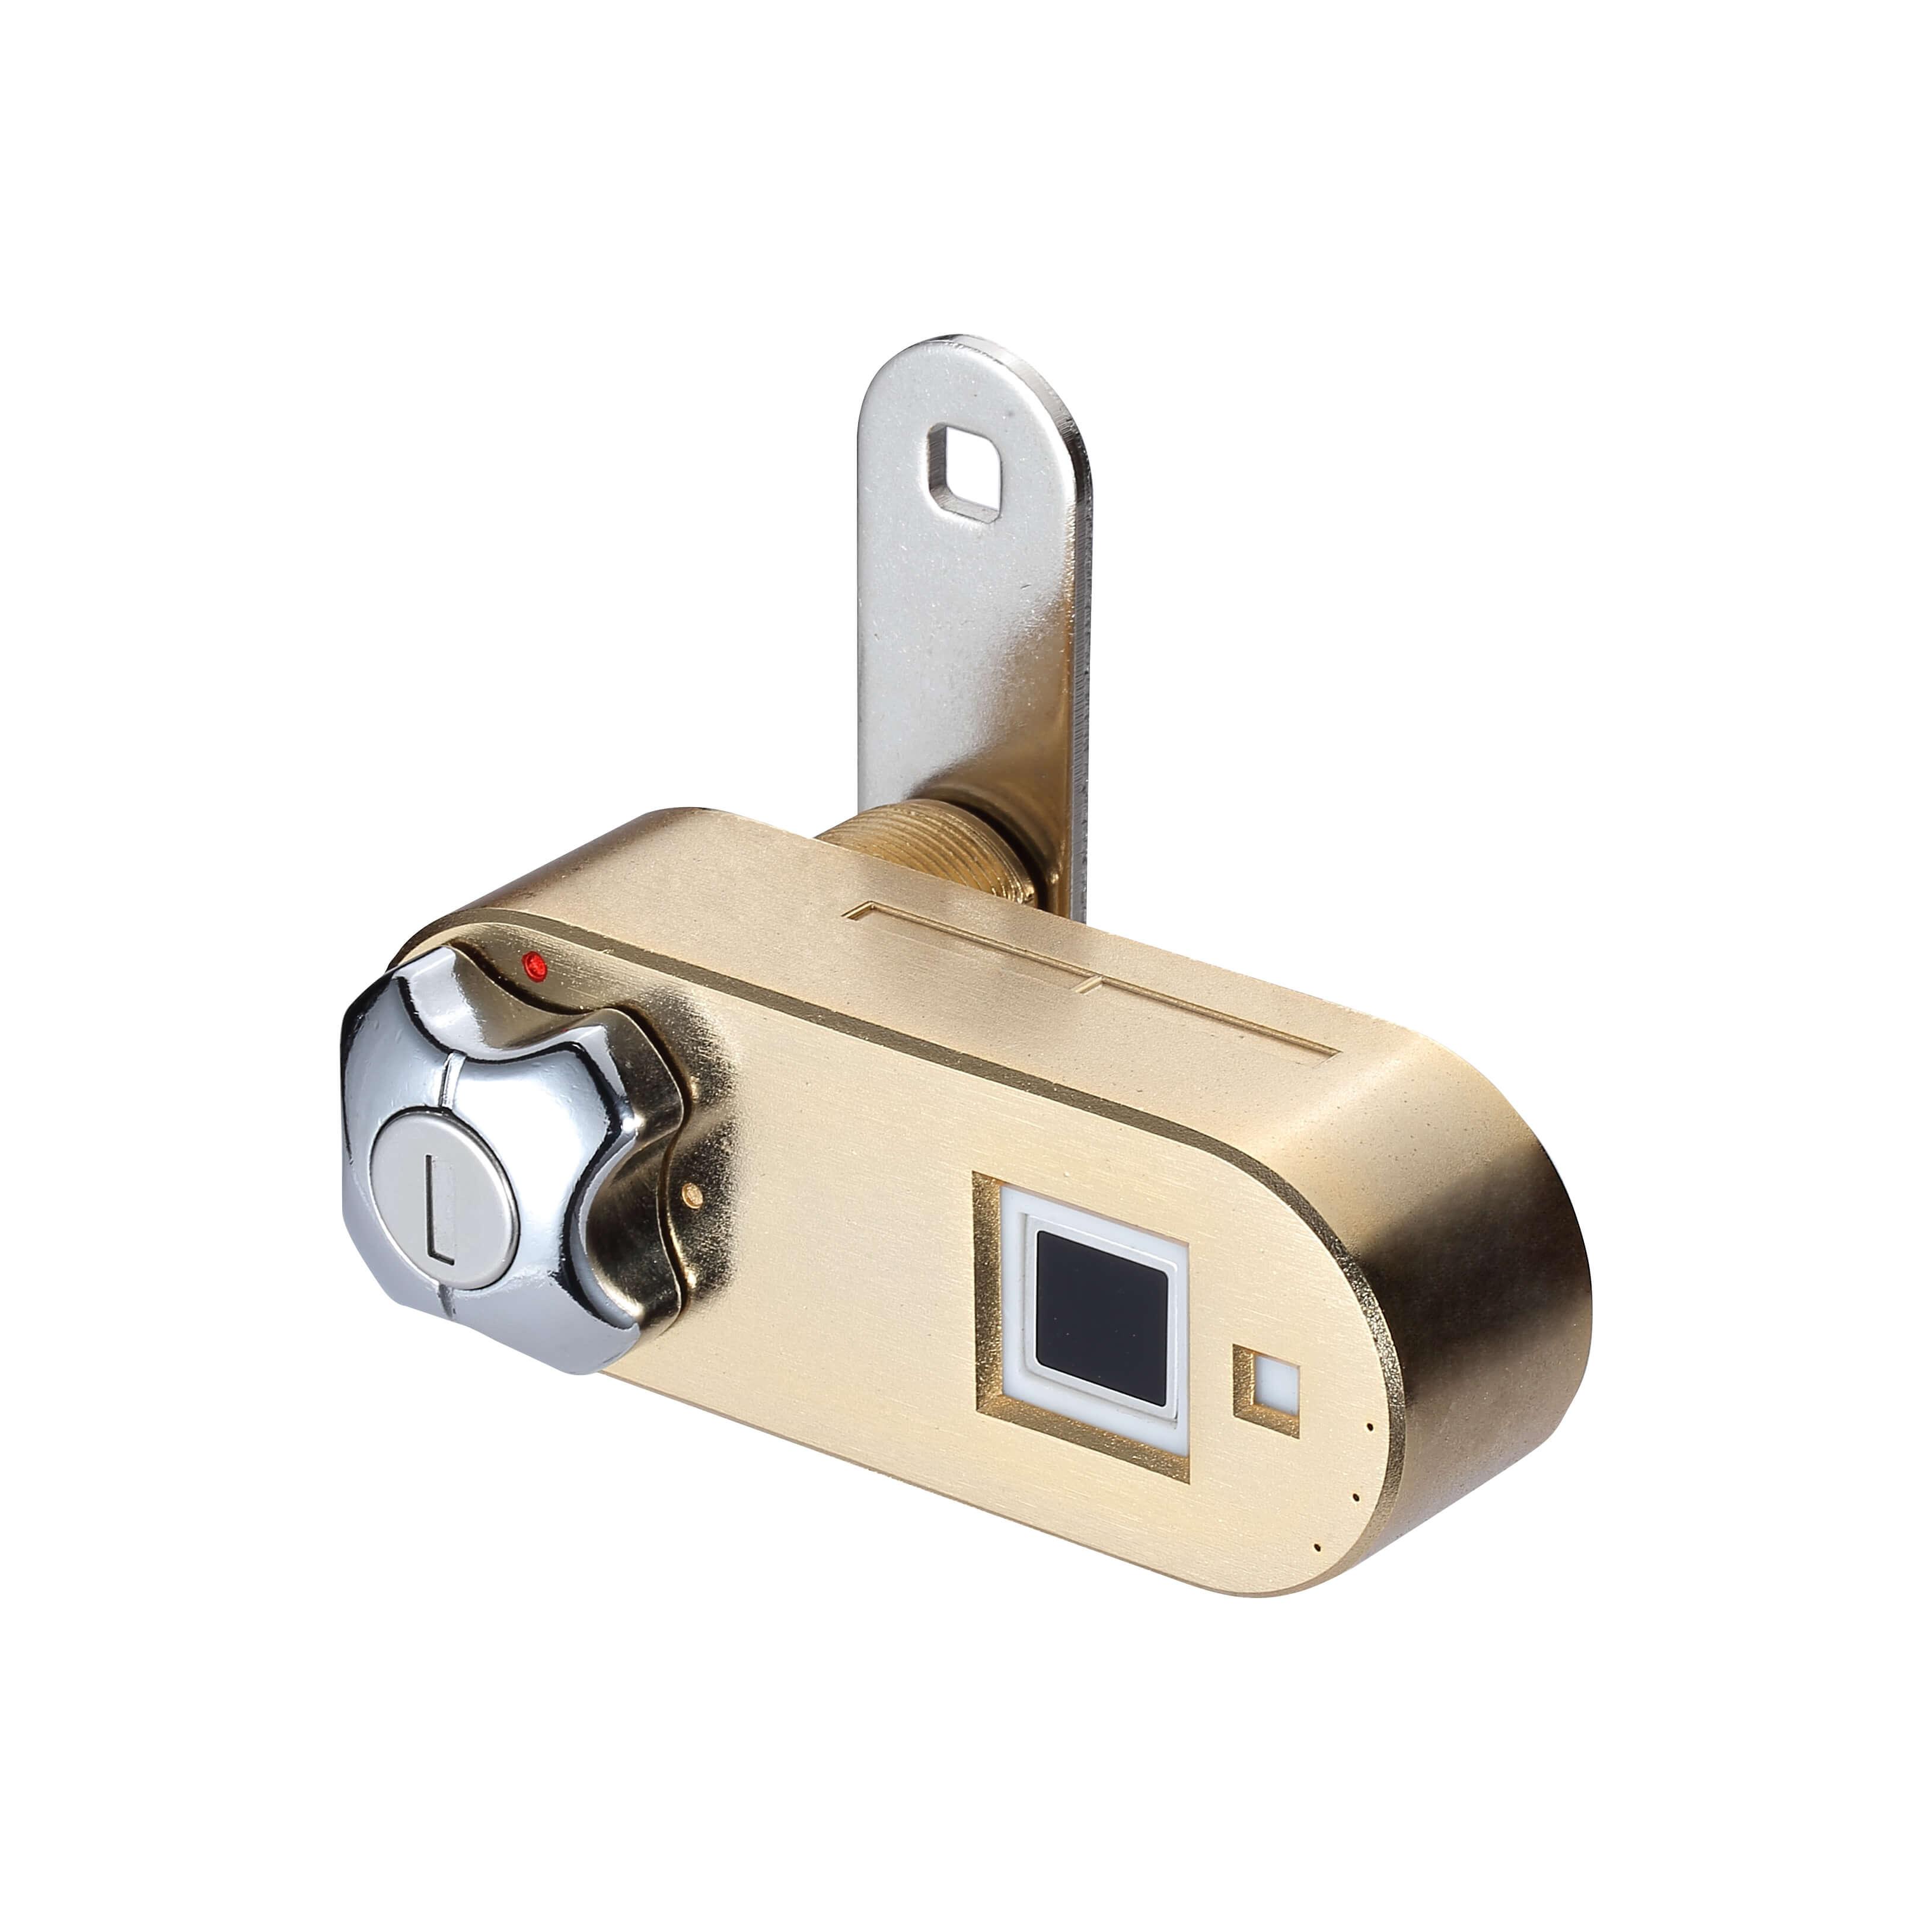 Golden Fingerprint Drawer Office Lock front look | Midas Touch